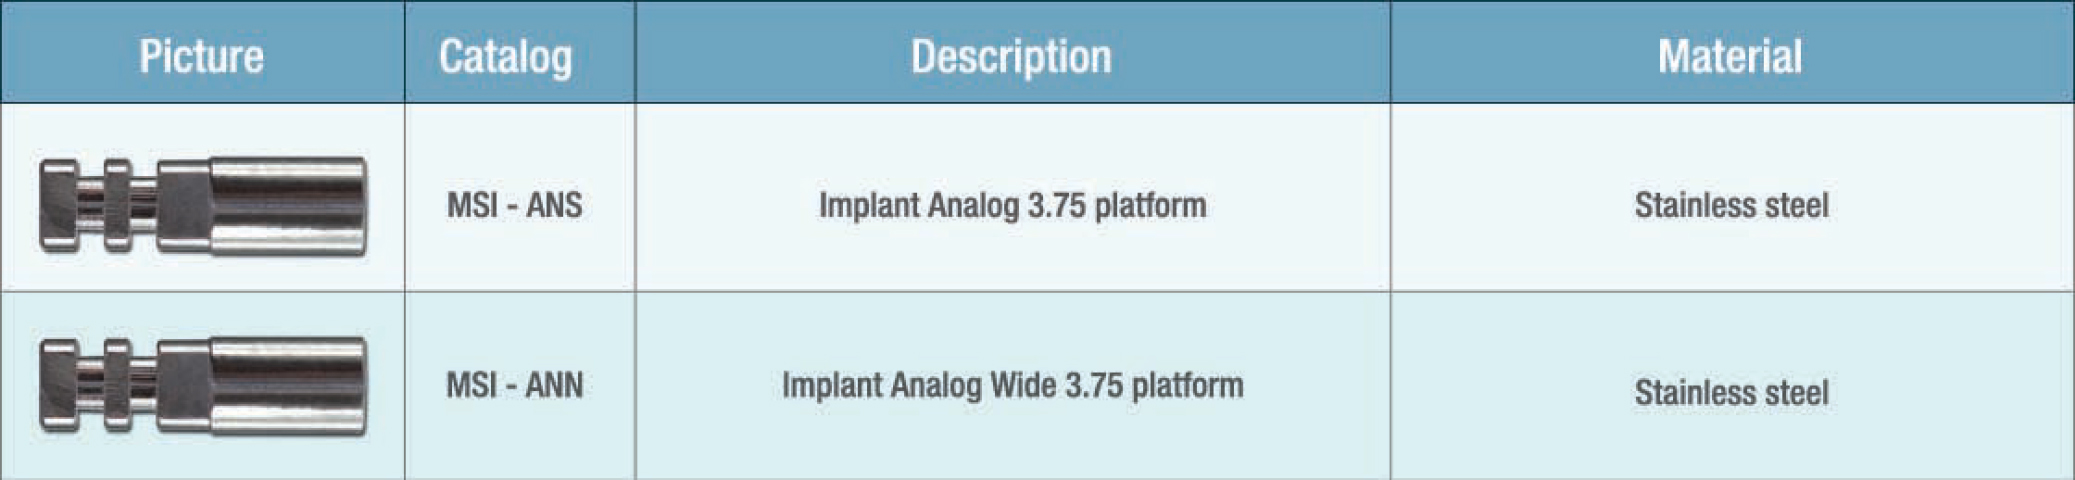 analogs spec sheet